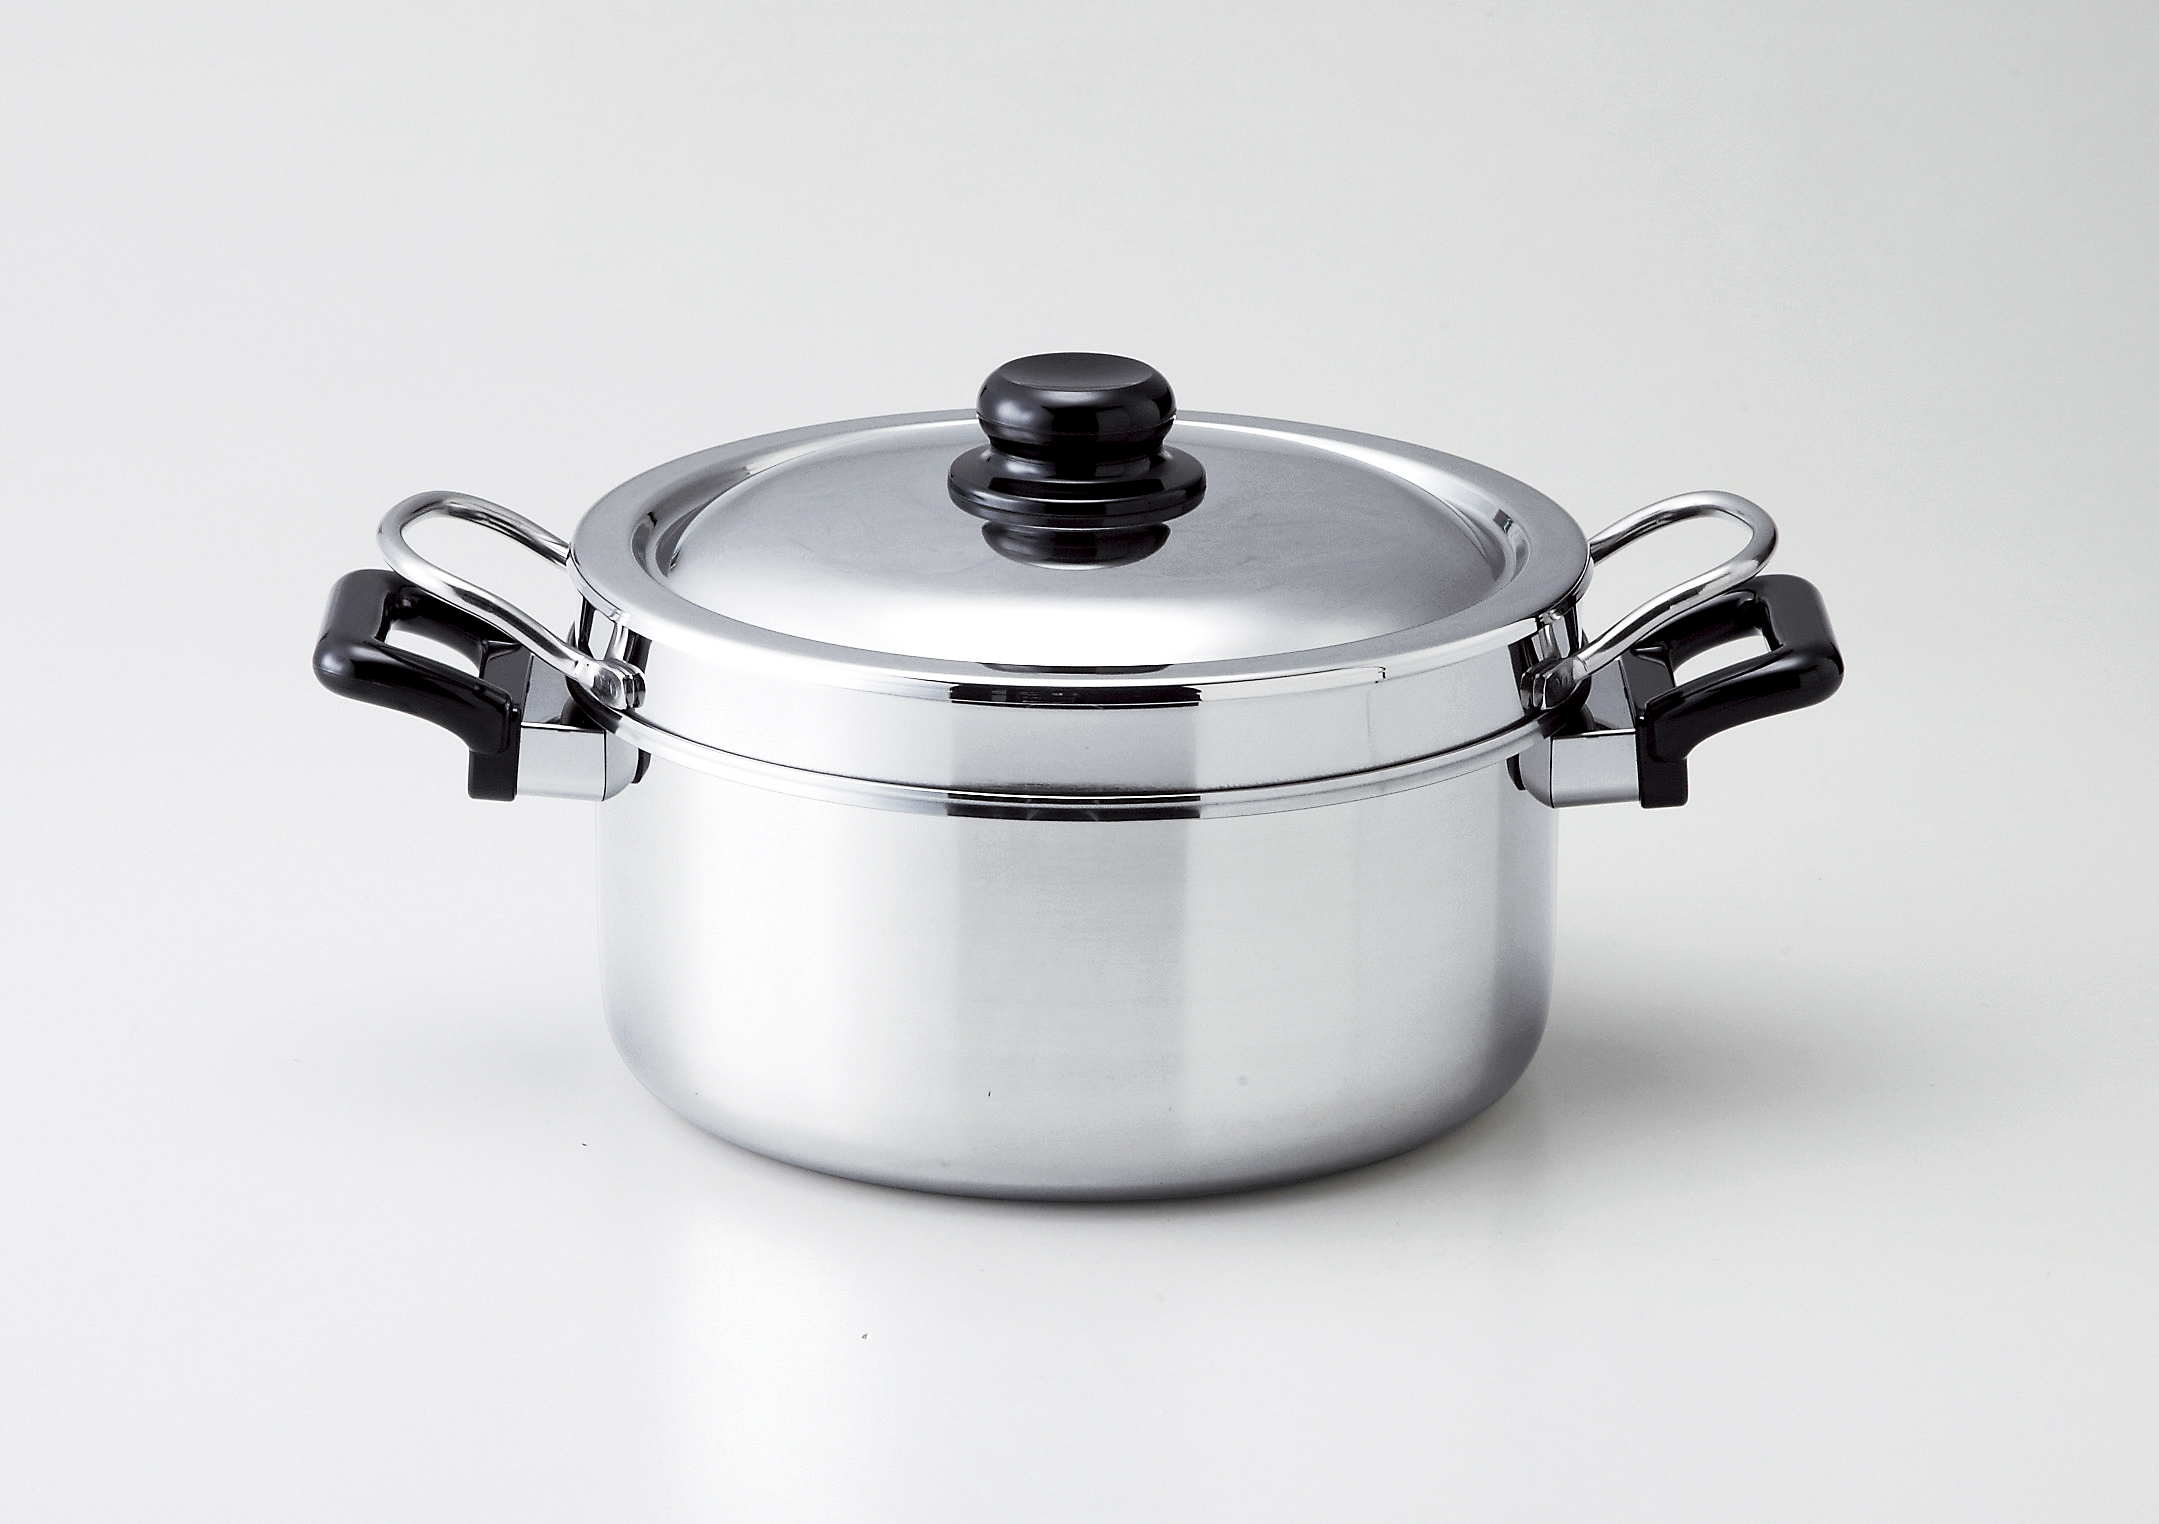 【霜龍器物】余熱&湯煎調理鍋セット